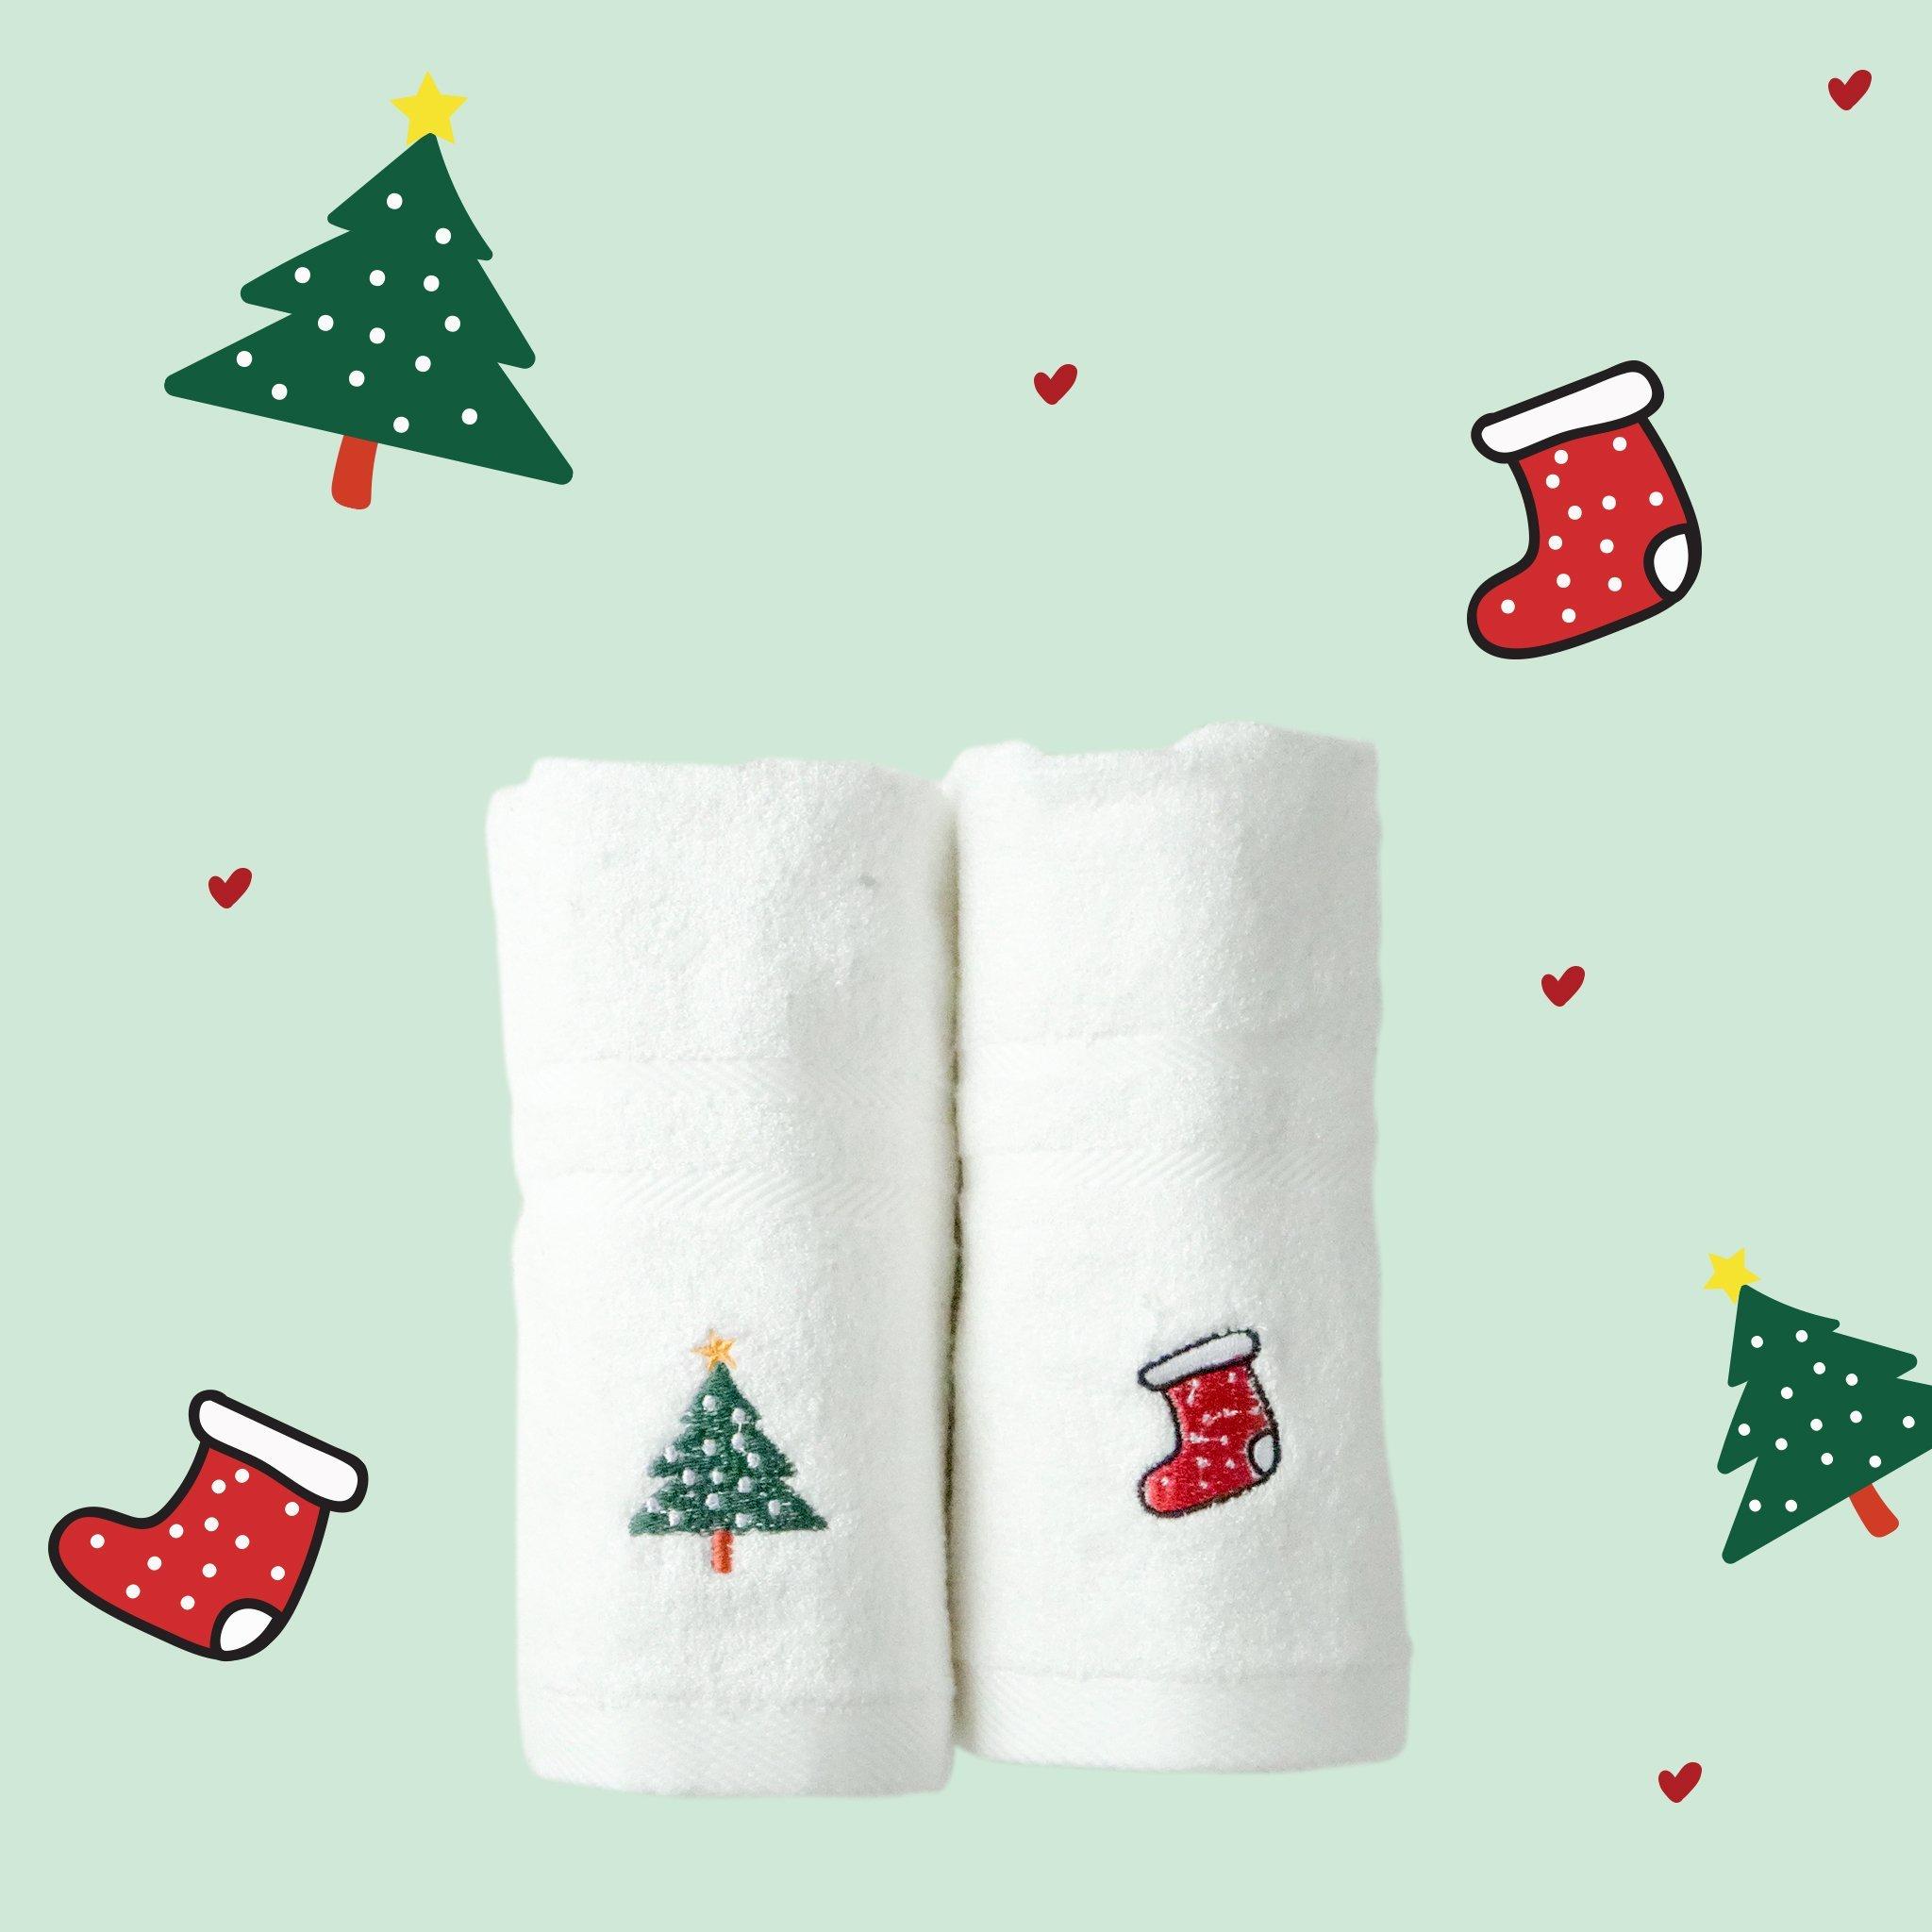 [PRE-ORDER] Khăn thêu Christmas